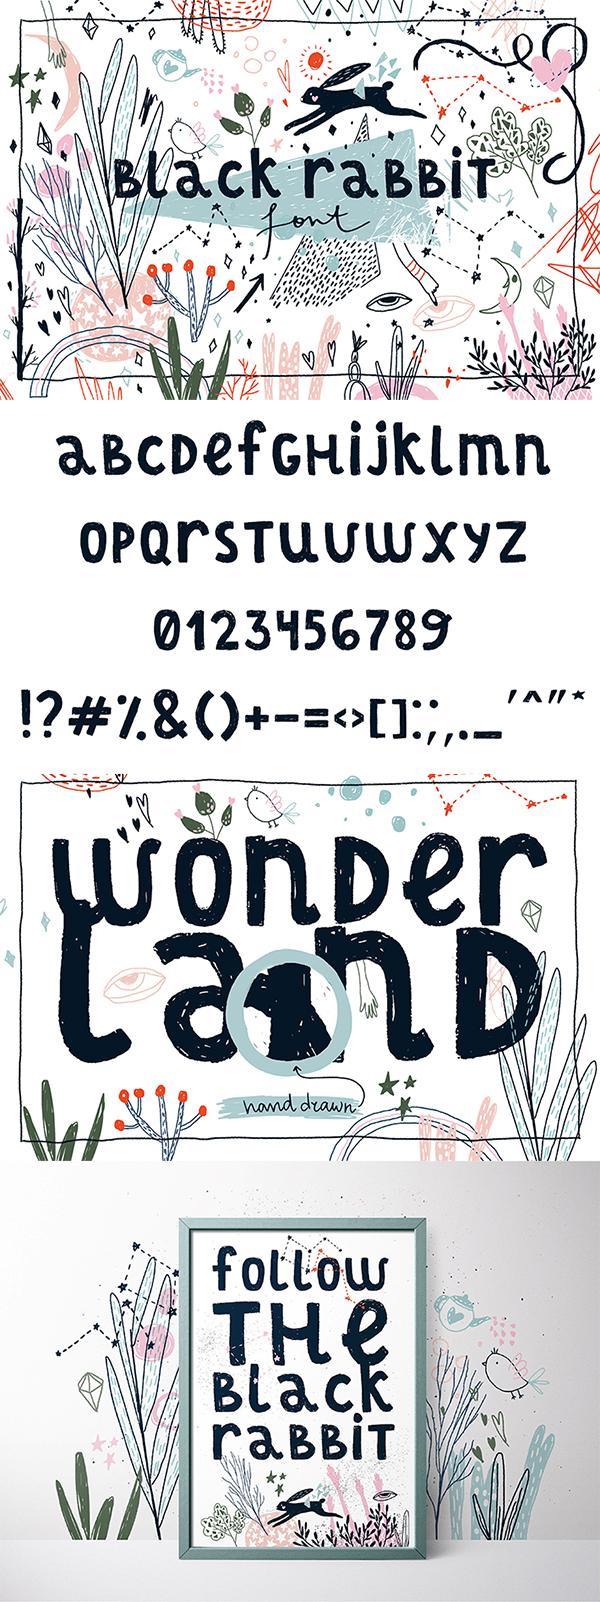 Freebie : Black Rabbit Hand-Drawn Font For Designers